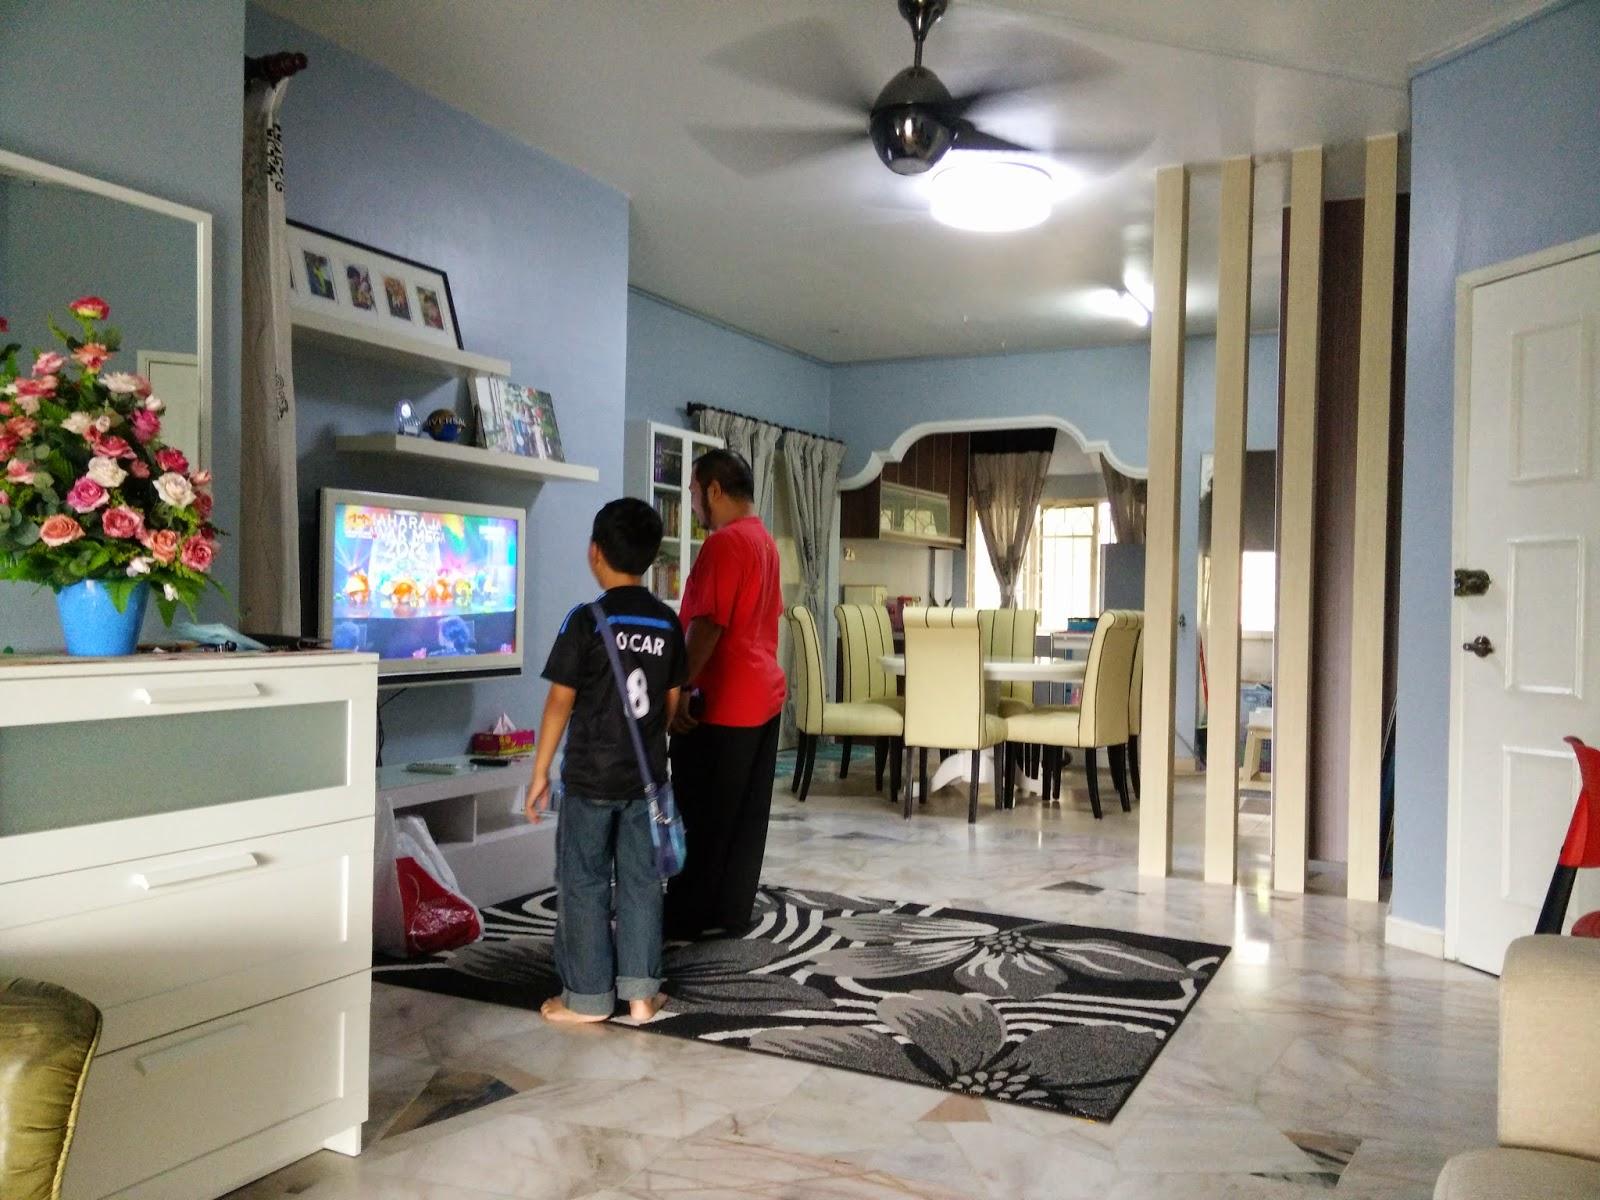 Ruang Yang Sama Selepas Renovation Divider Kayu Credit To Fudec Price Rm1400